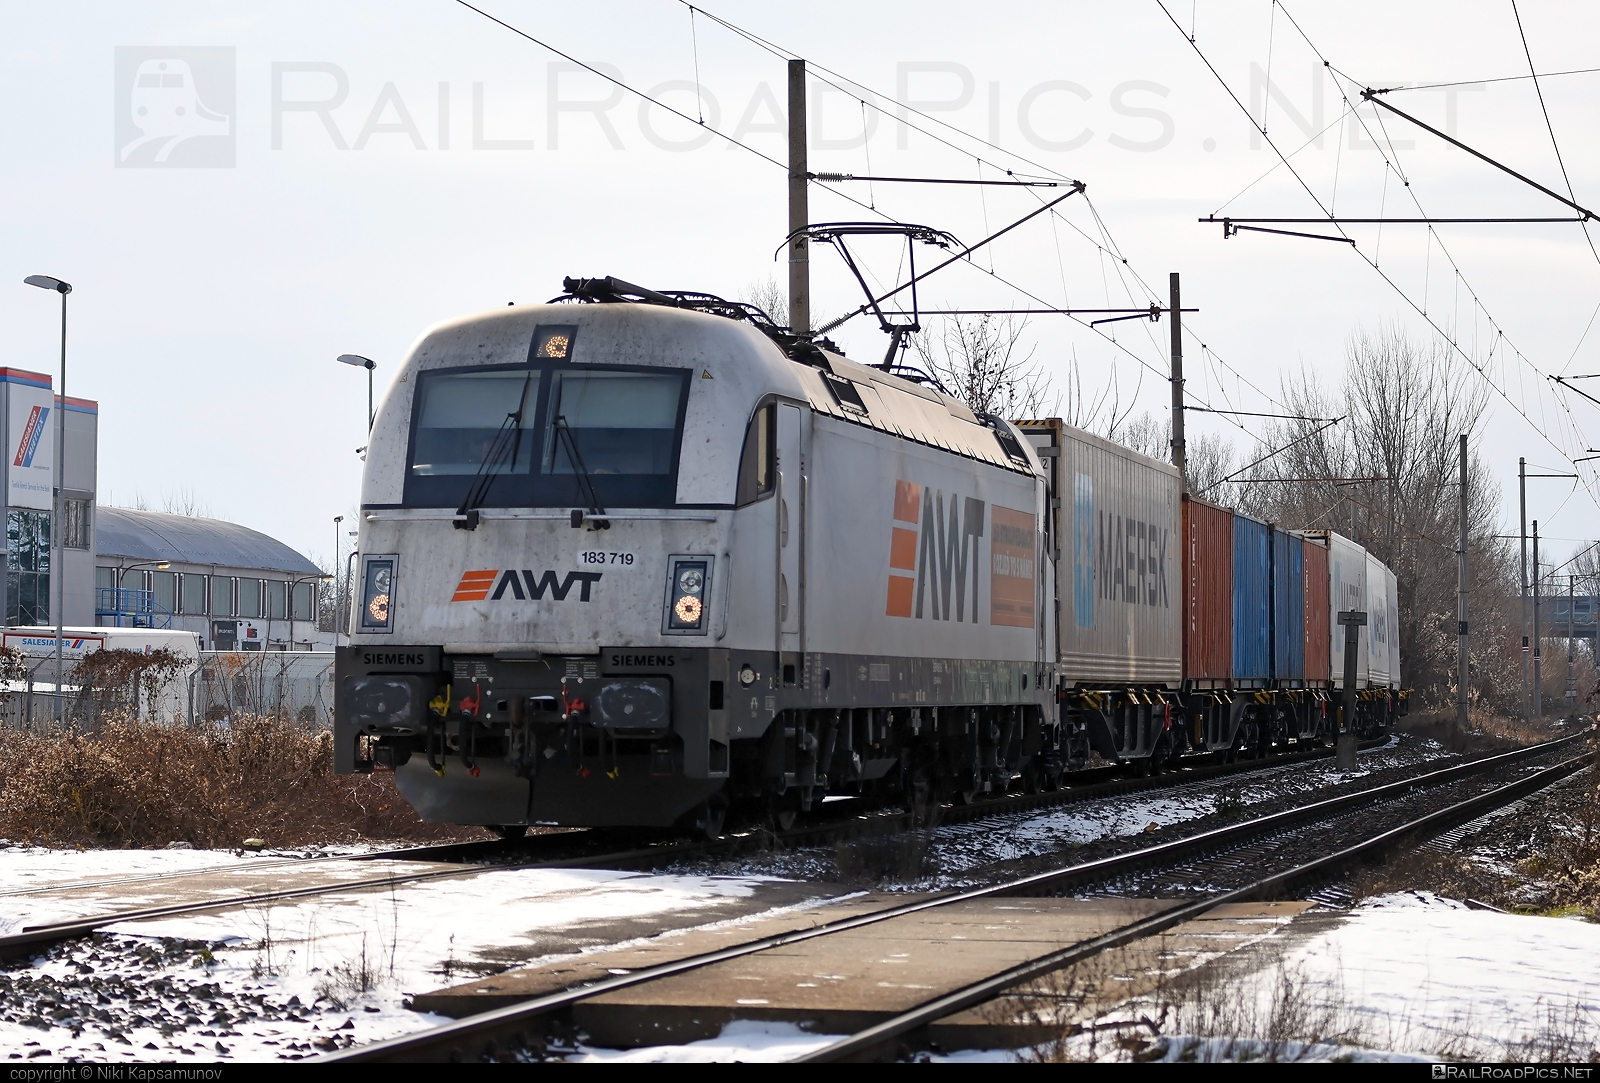 Siemens ES 64 U4 - 183 719 operated by PKP CARGO INTERNATIONAL a.s. #awt #container #es64 #es64u #es64u4 #eurosprinter #flatwagon #pkpcargo #pkpcargointernational #pkpcargointernationalas #siemens #siemenses64 #siemenses64u #siemenses64u4 #siemenstaurus #taurus #tauruslocomotive